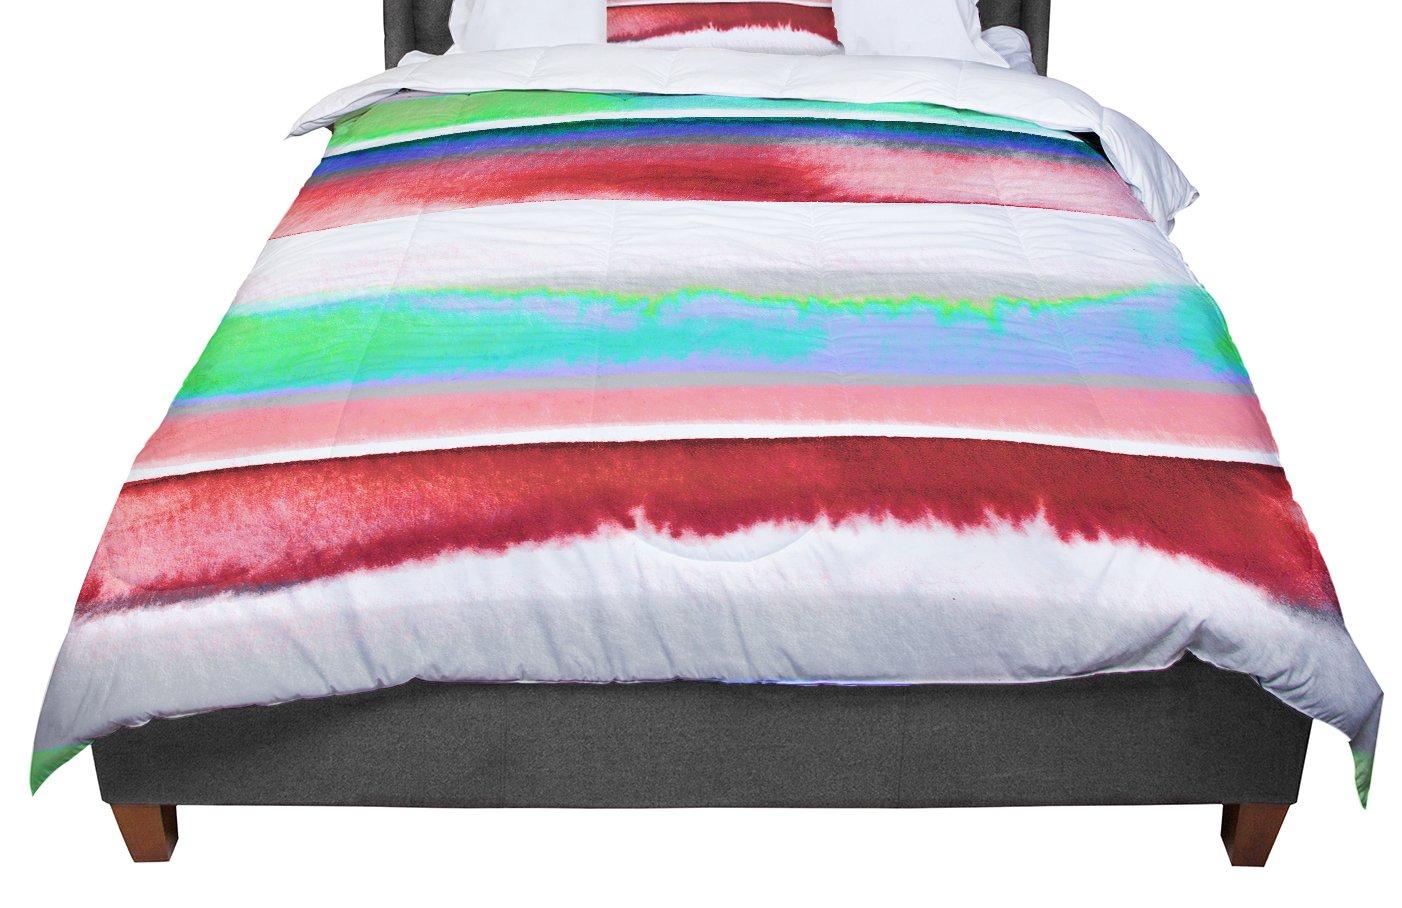 KESS InHouse Ebi Emporium 'Prism Stripe 2' Red Blue King / Cal King Comforter, 104' X 88'